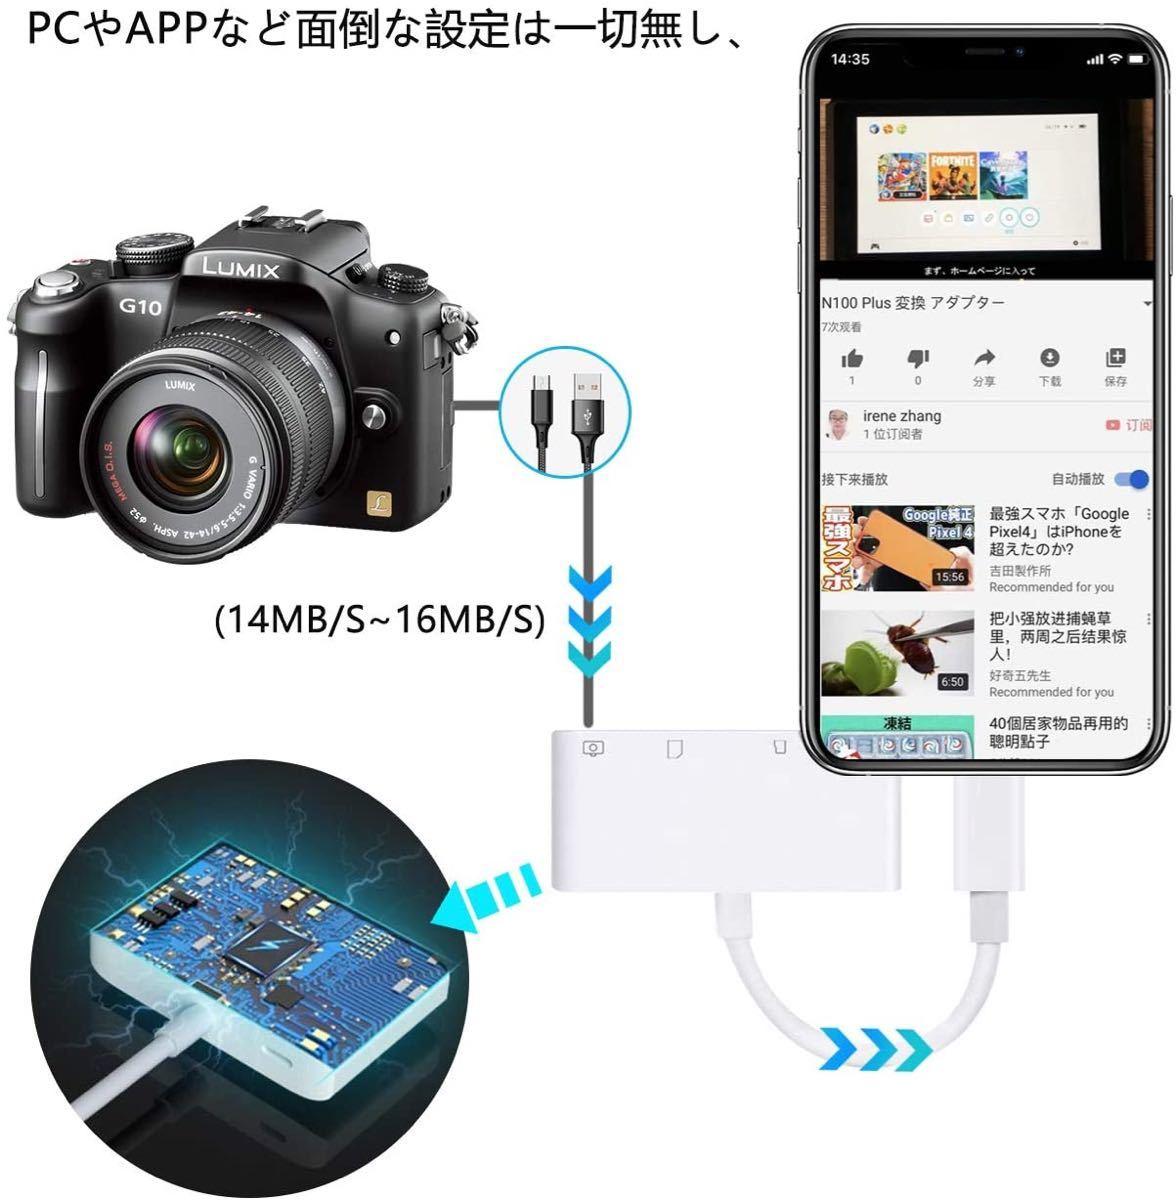 iPhone SD カードリーダー 最新 iOS14 双方向 データ転送 充電 SDカードリーダー iPhone iPad